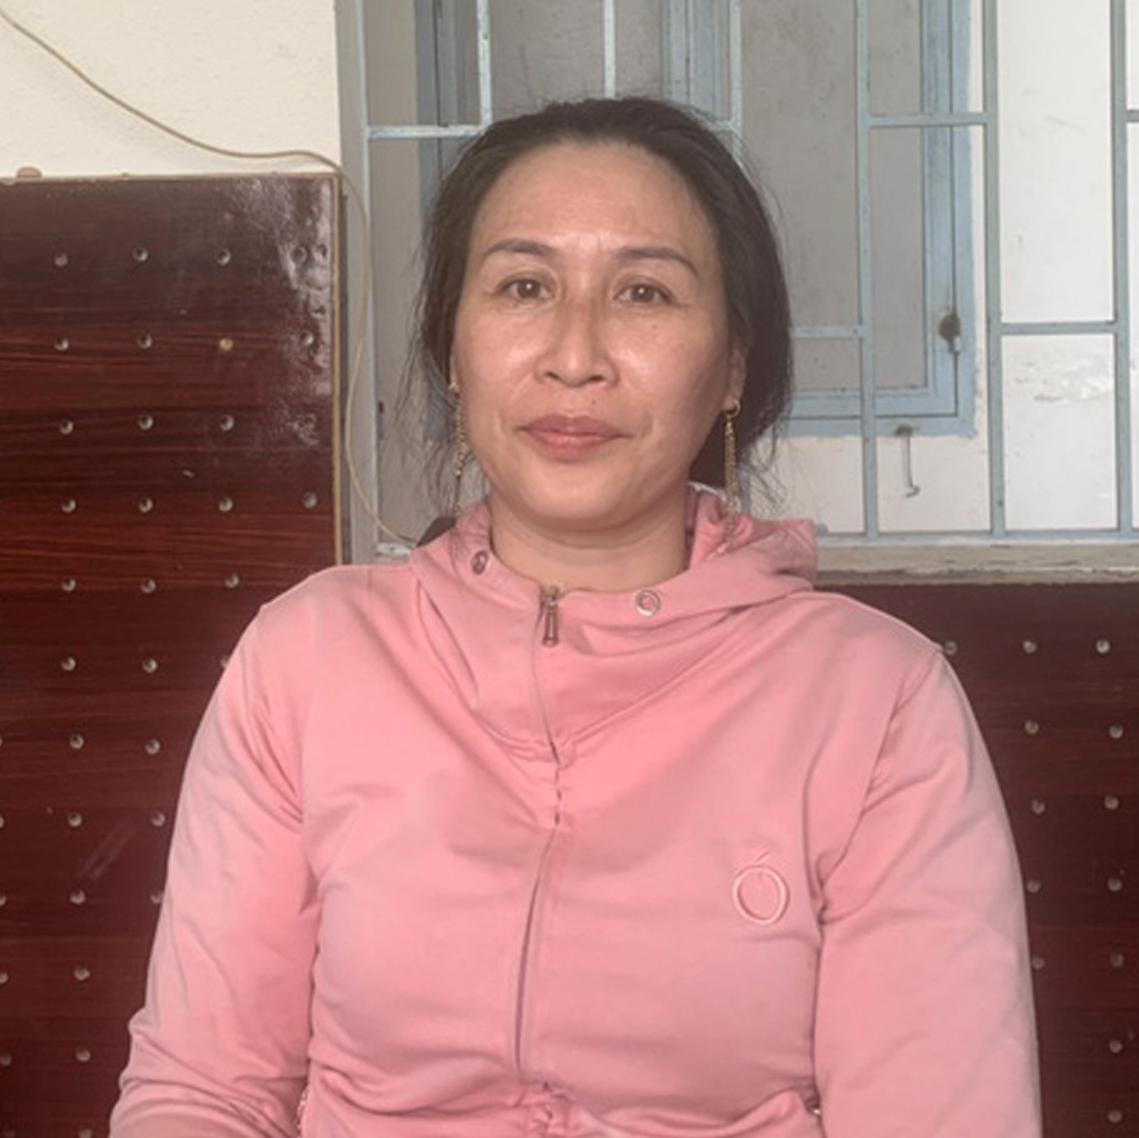 Le Thi Binh